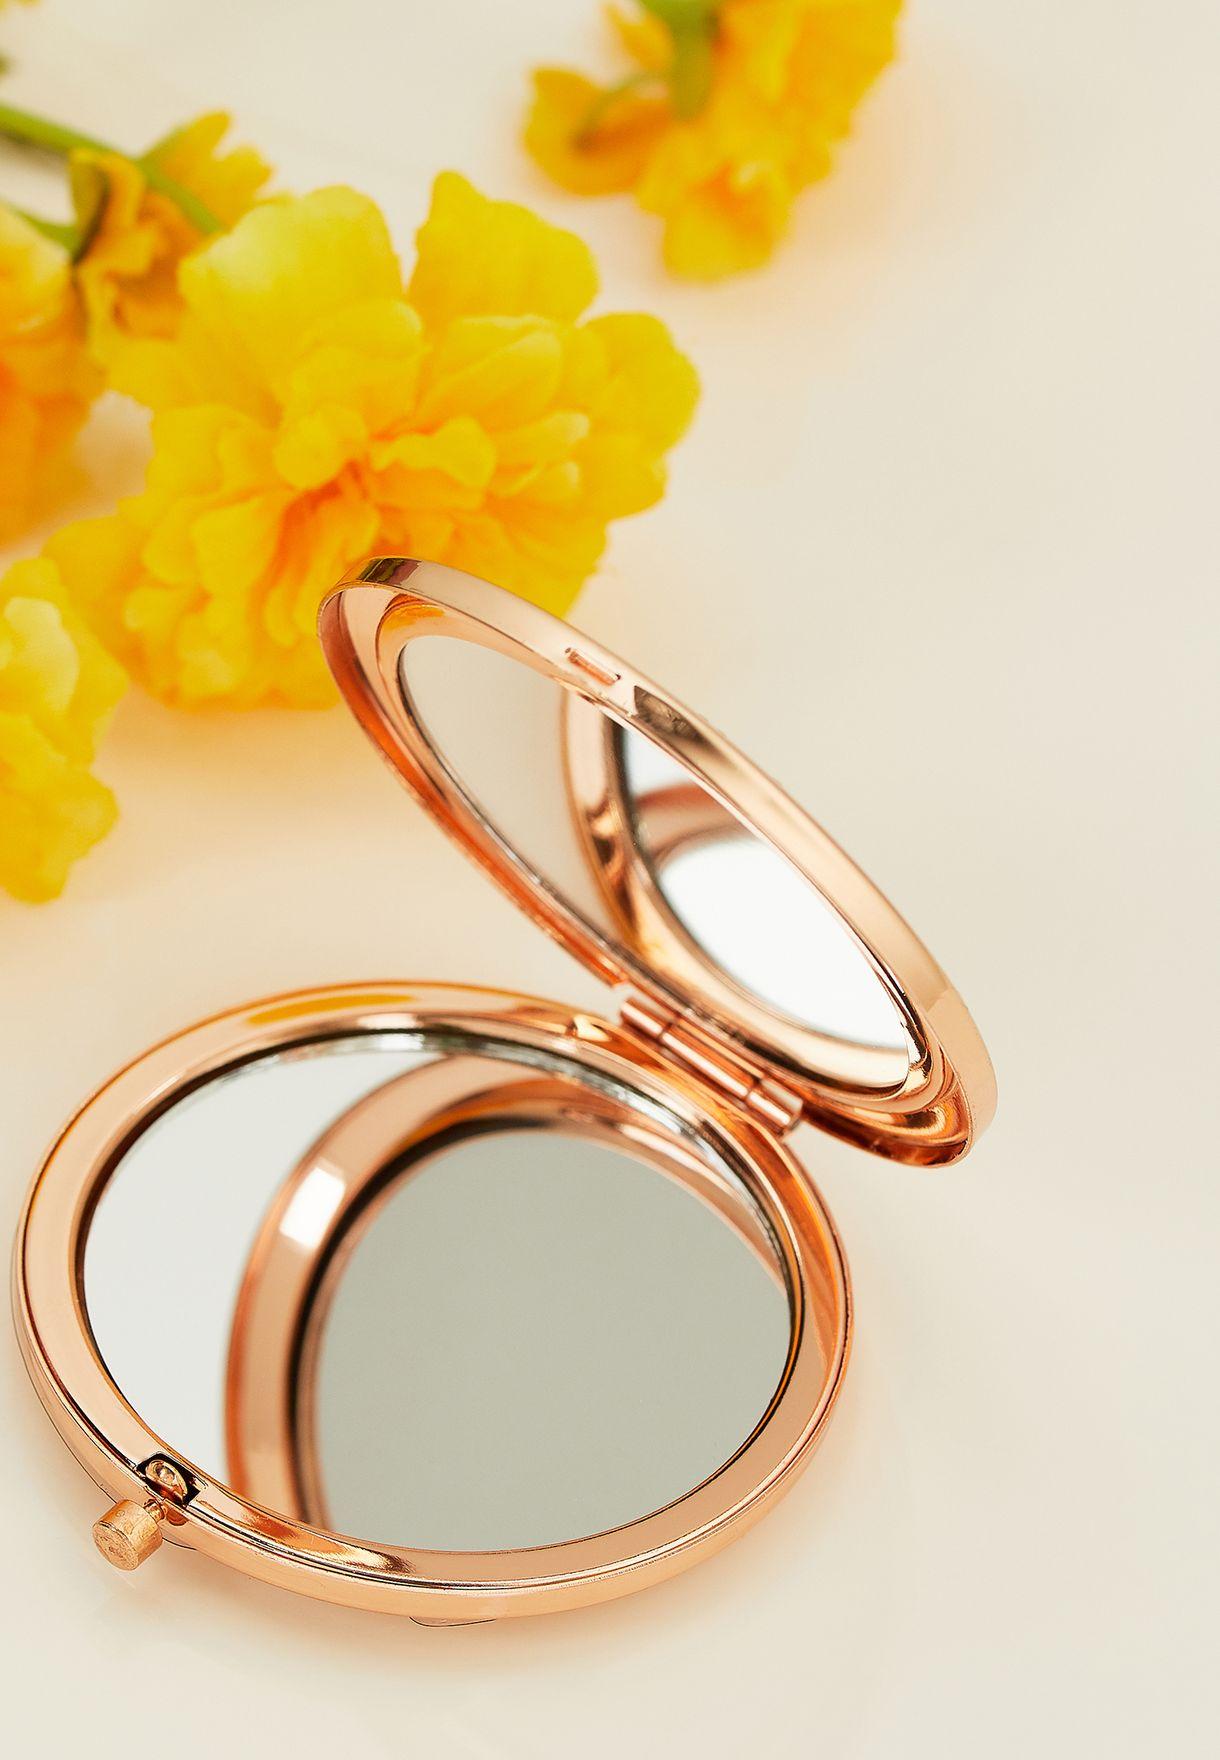 Rhinestone Compact Mirror